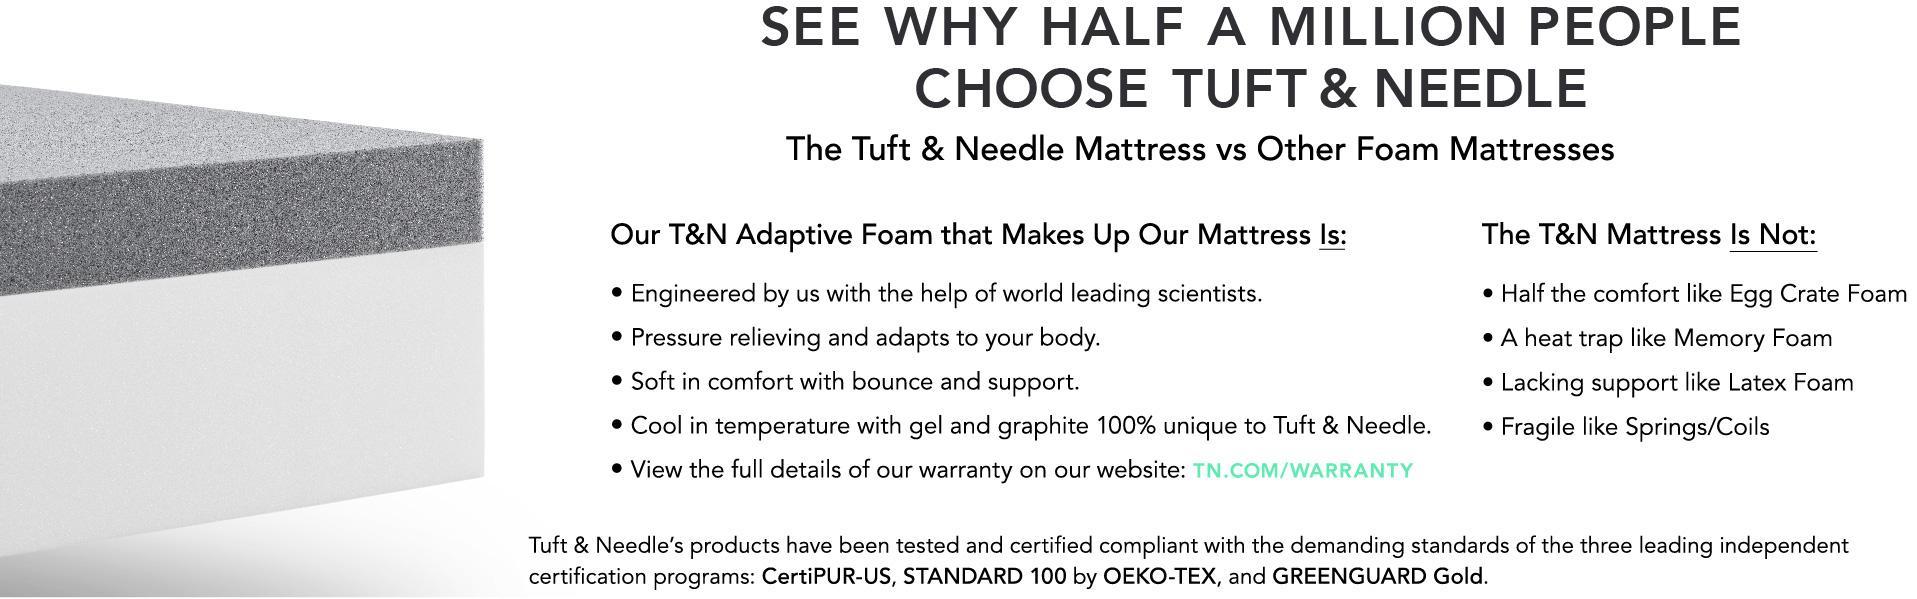 Amazon Tuft Needle Queen Mattress Bed In A Box TN Adaptive